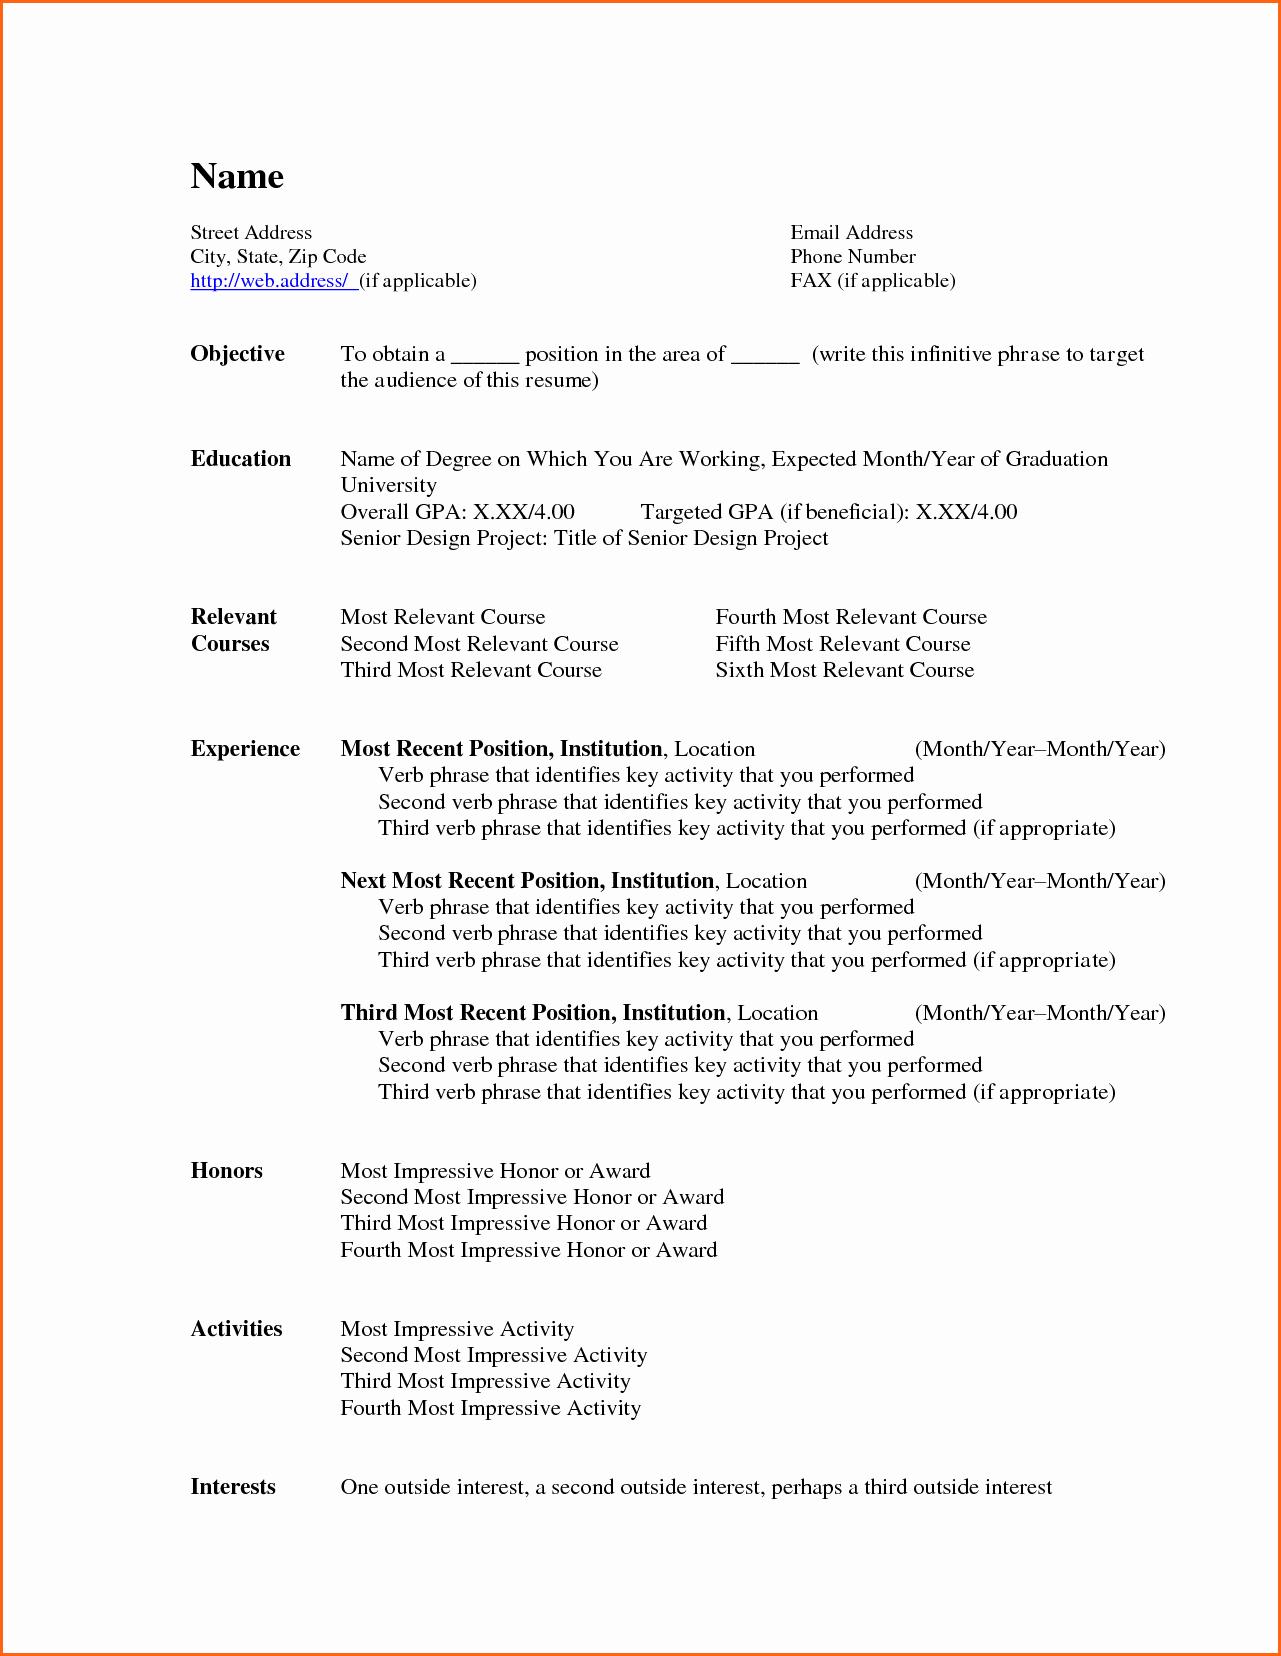 Microsoft Word Resume Templates 2007 Elegant 6 Free Resume Templates Microsoft Word 2007 Bud